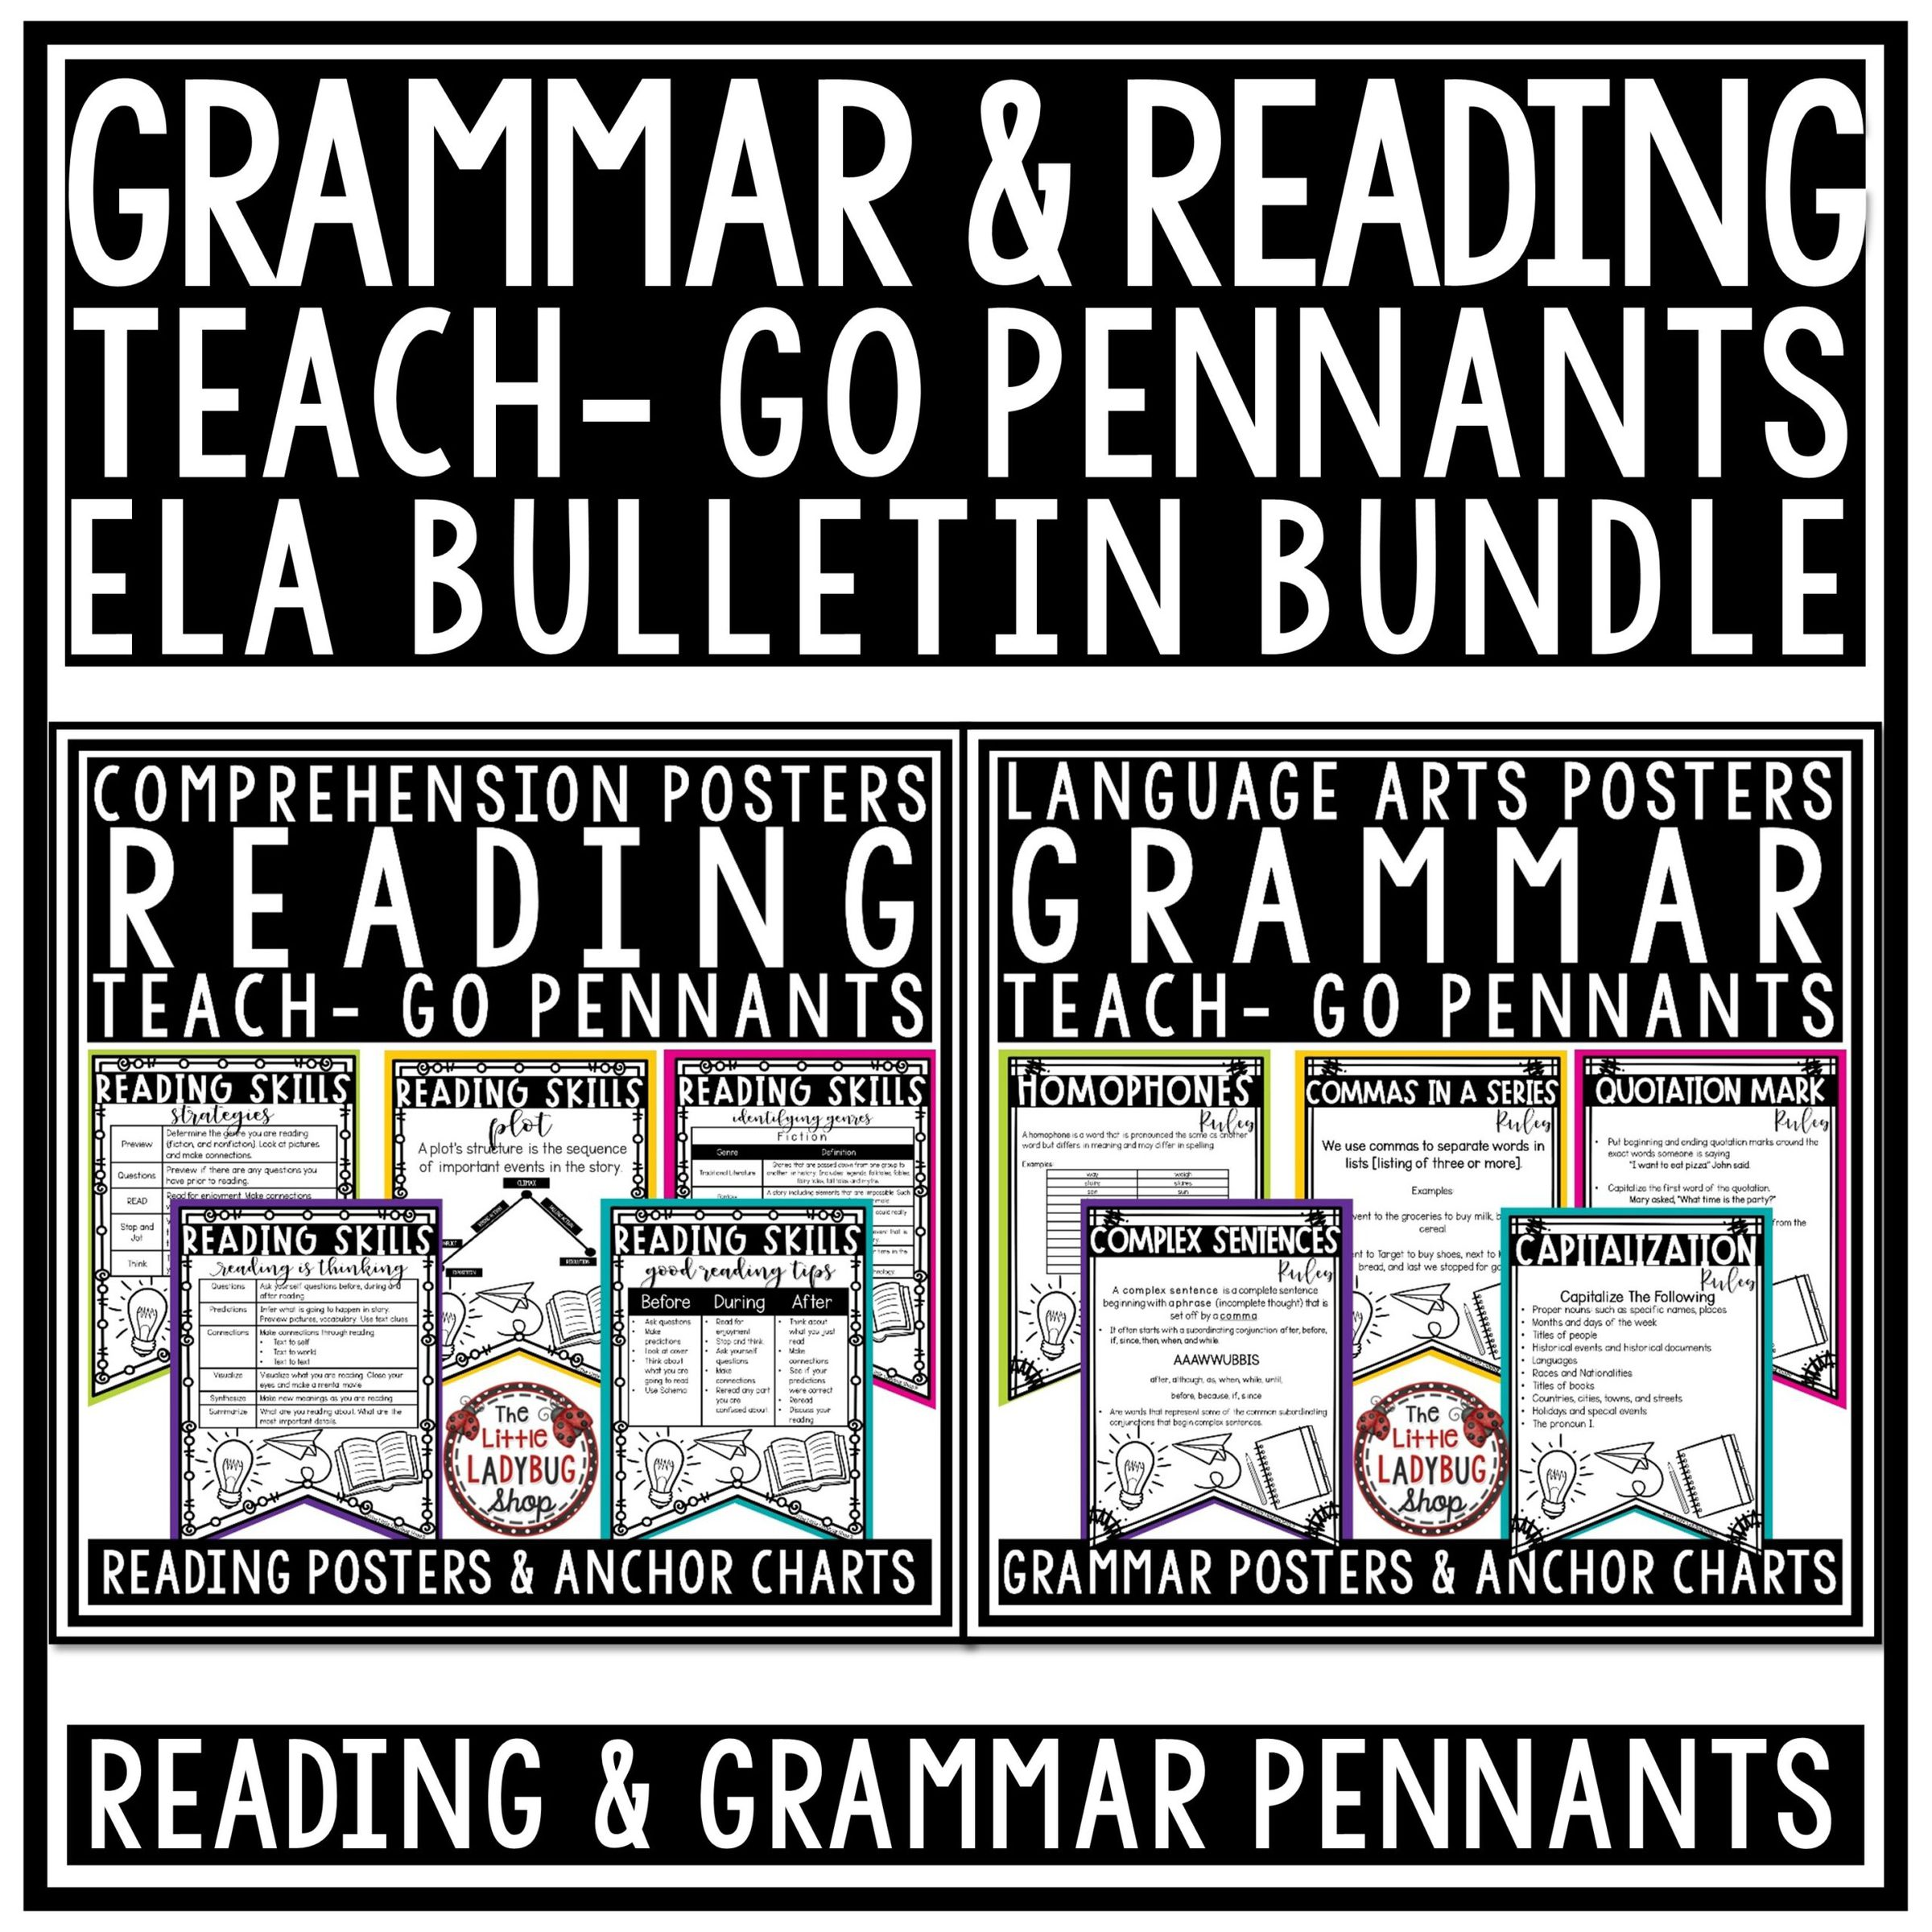 Teaching Grammar in upper elementary